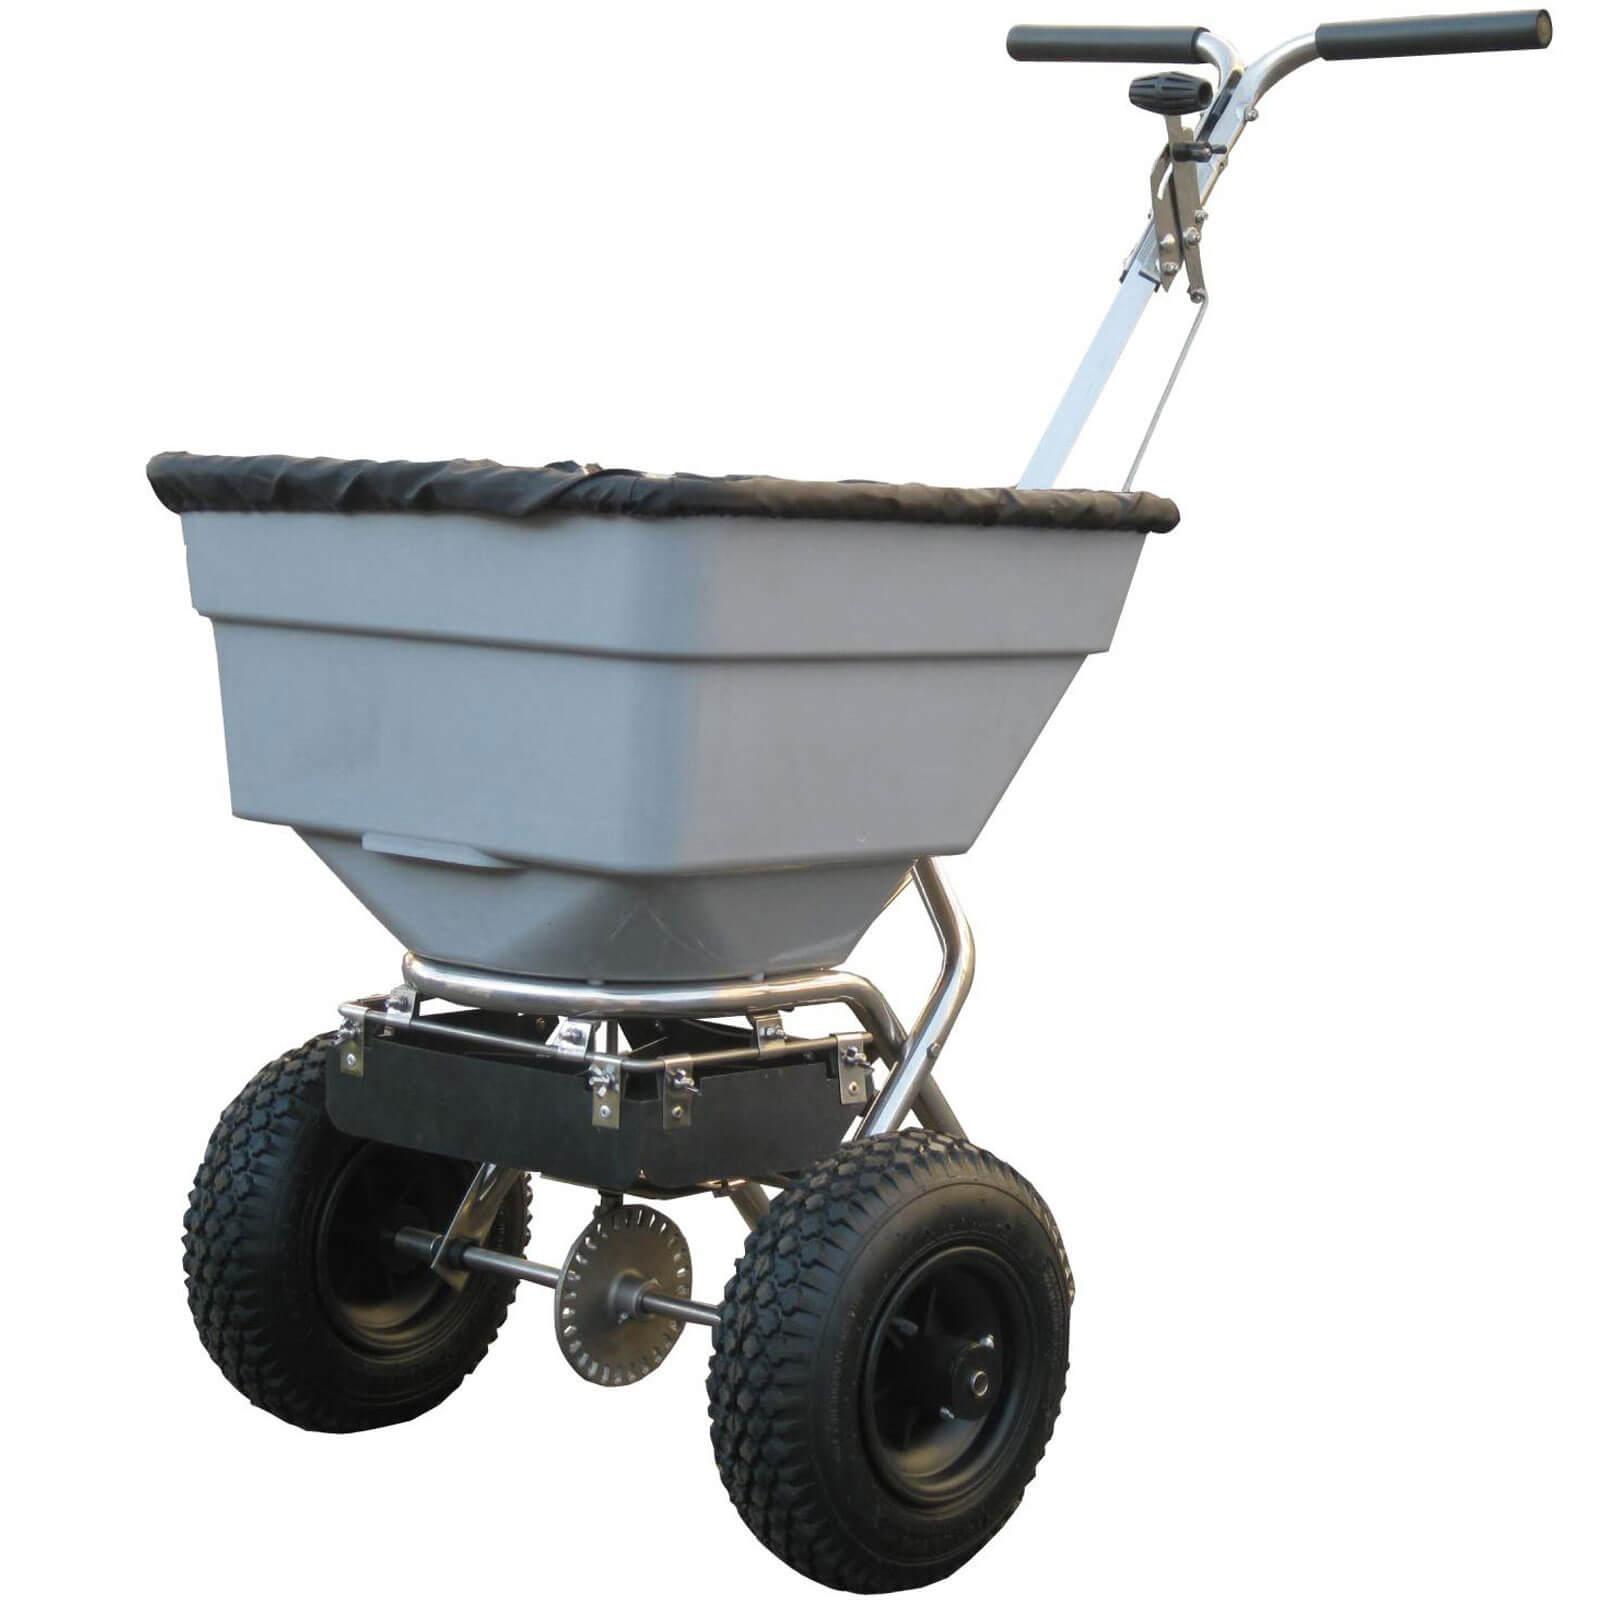 Handy Stainless Steel Push Grass, Feed & Salt Broadcast Spreader 3 Metre Spread Width 45kg Capacity